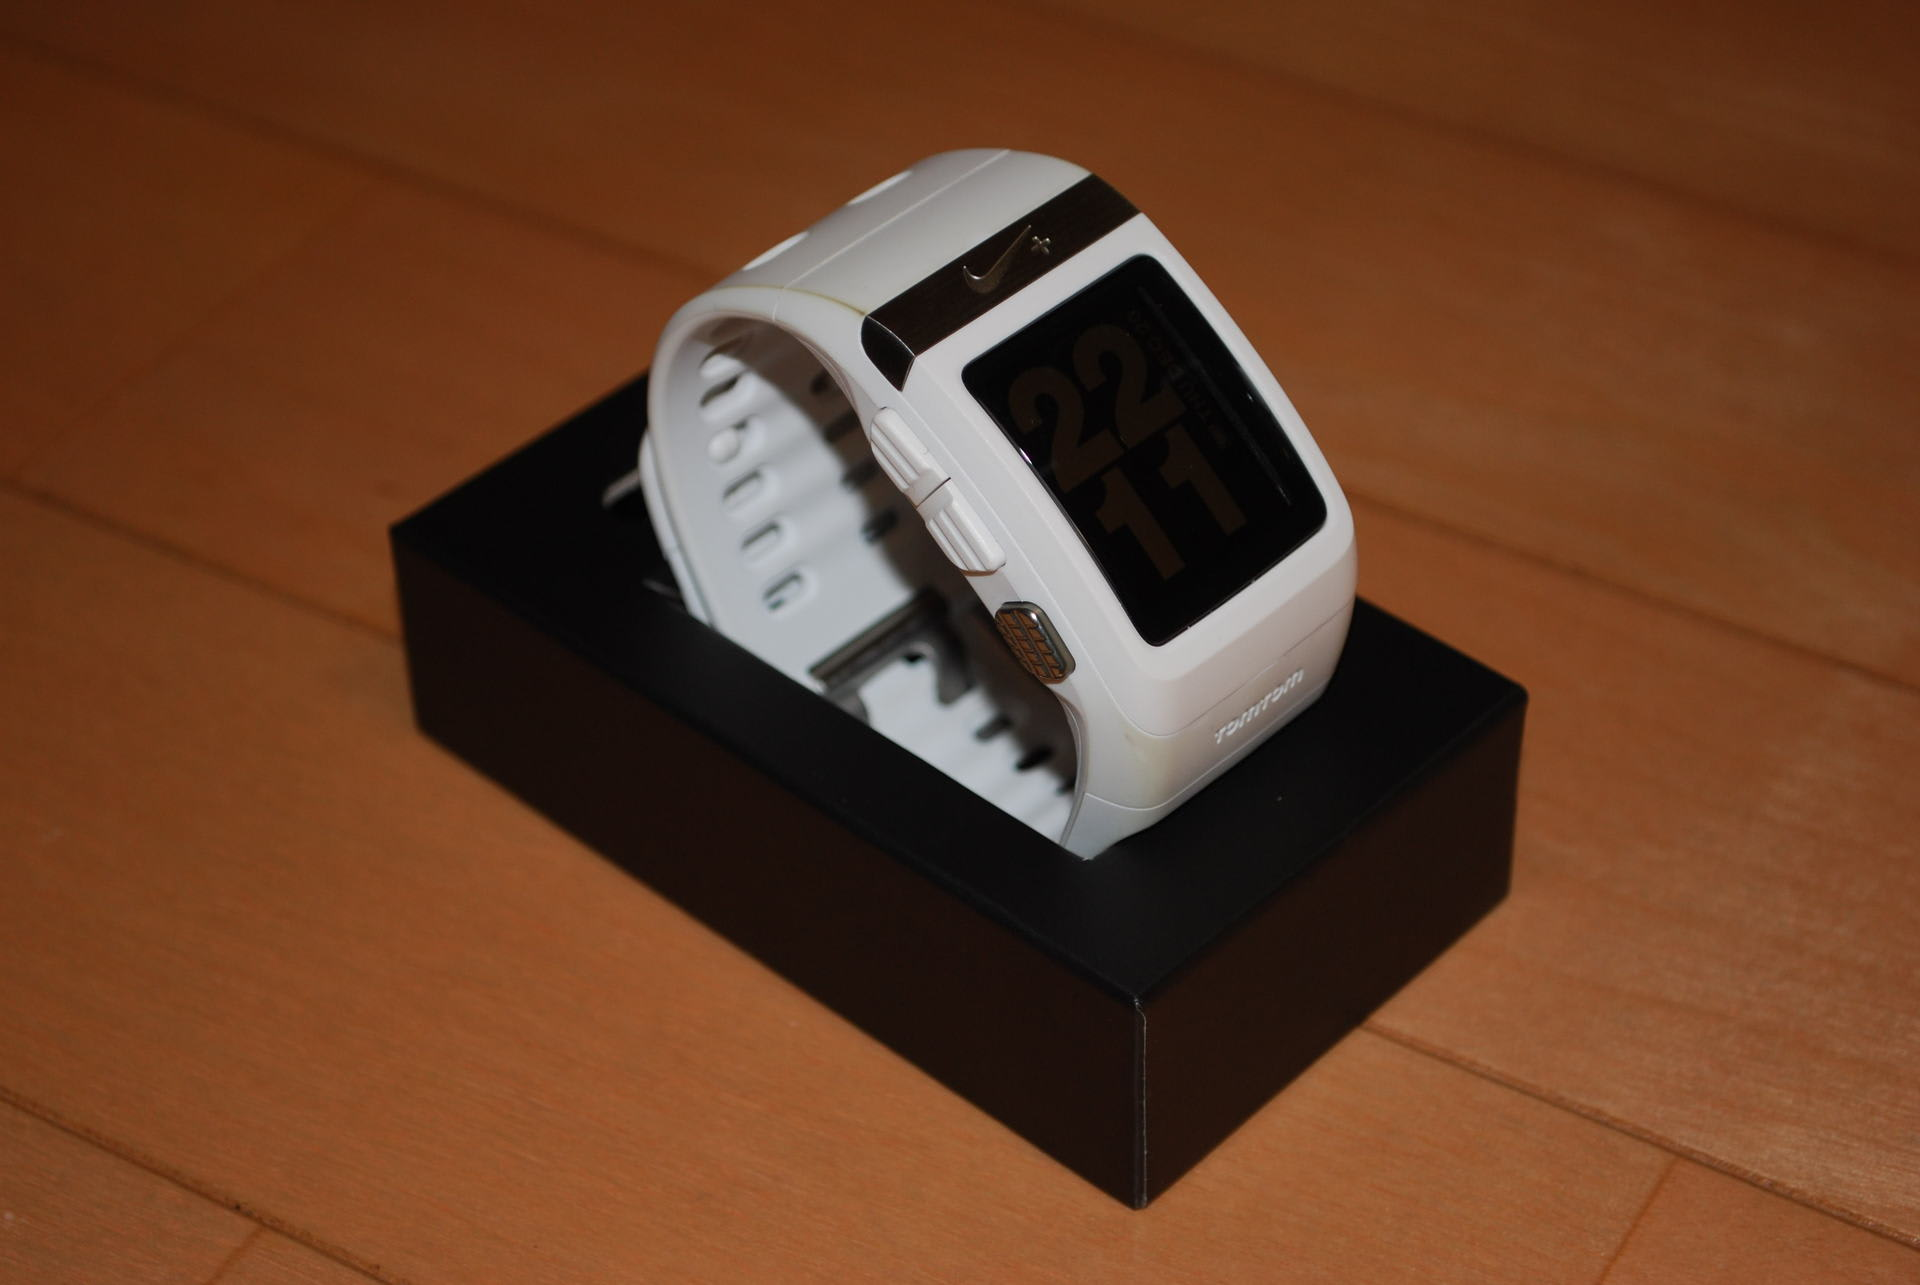 c5ce69af75 今回は一昨日に購入した『Nike+ SportWatch GPS』のレビューを書いていきたいと思います。